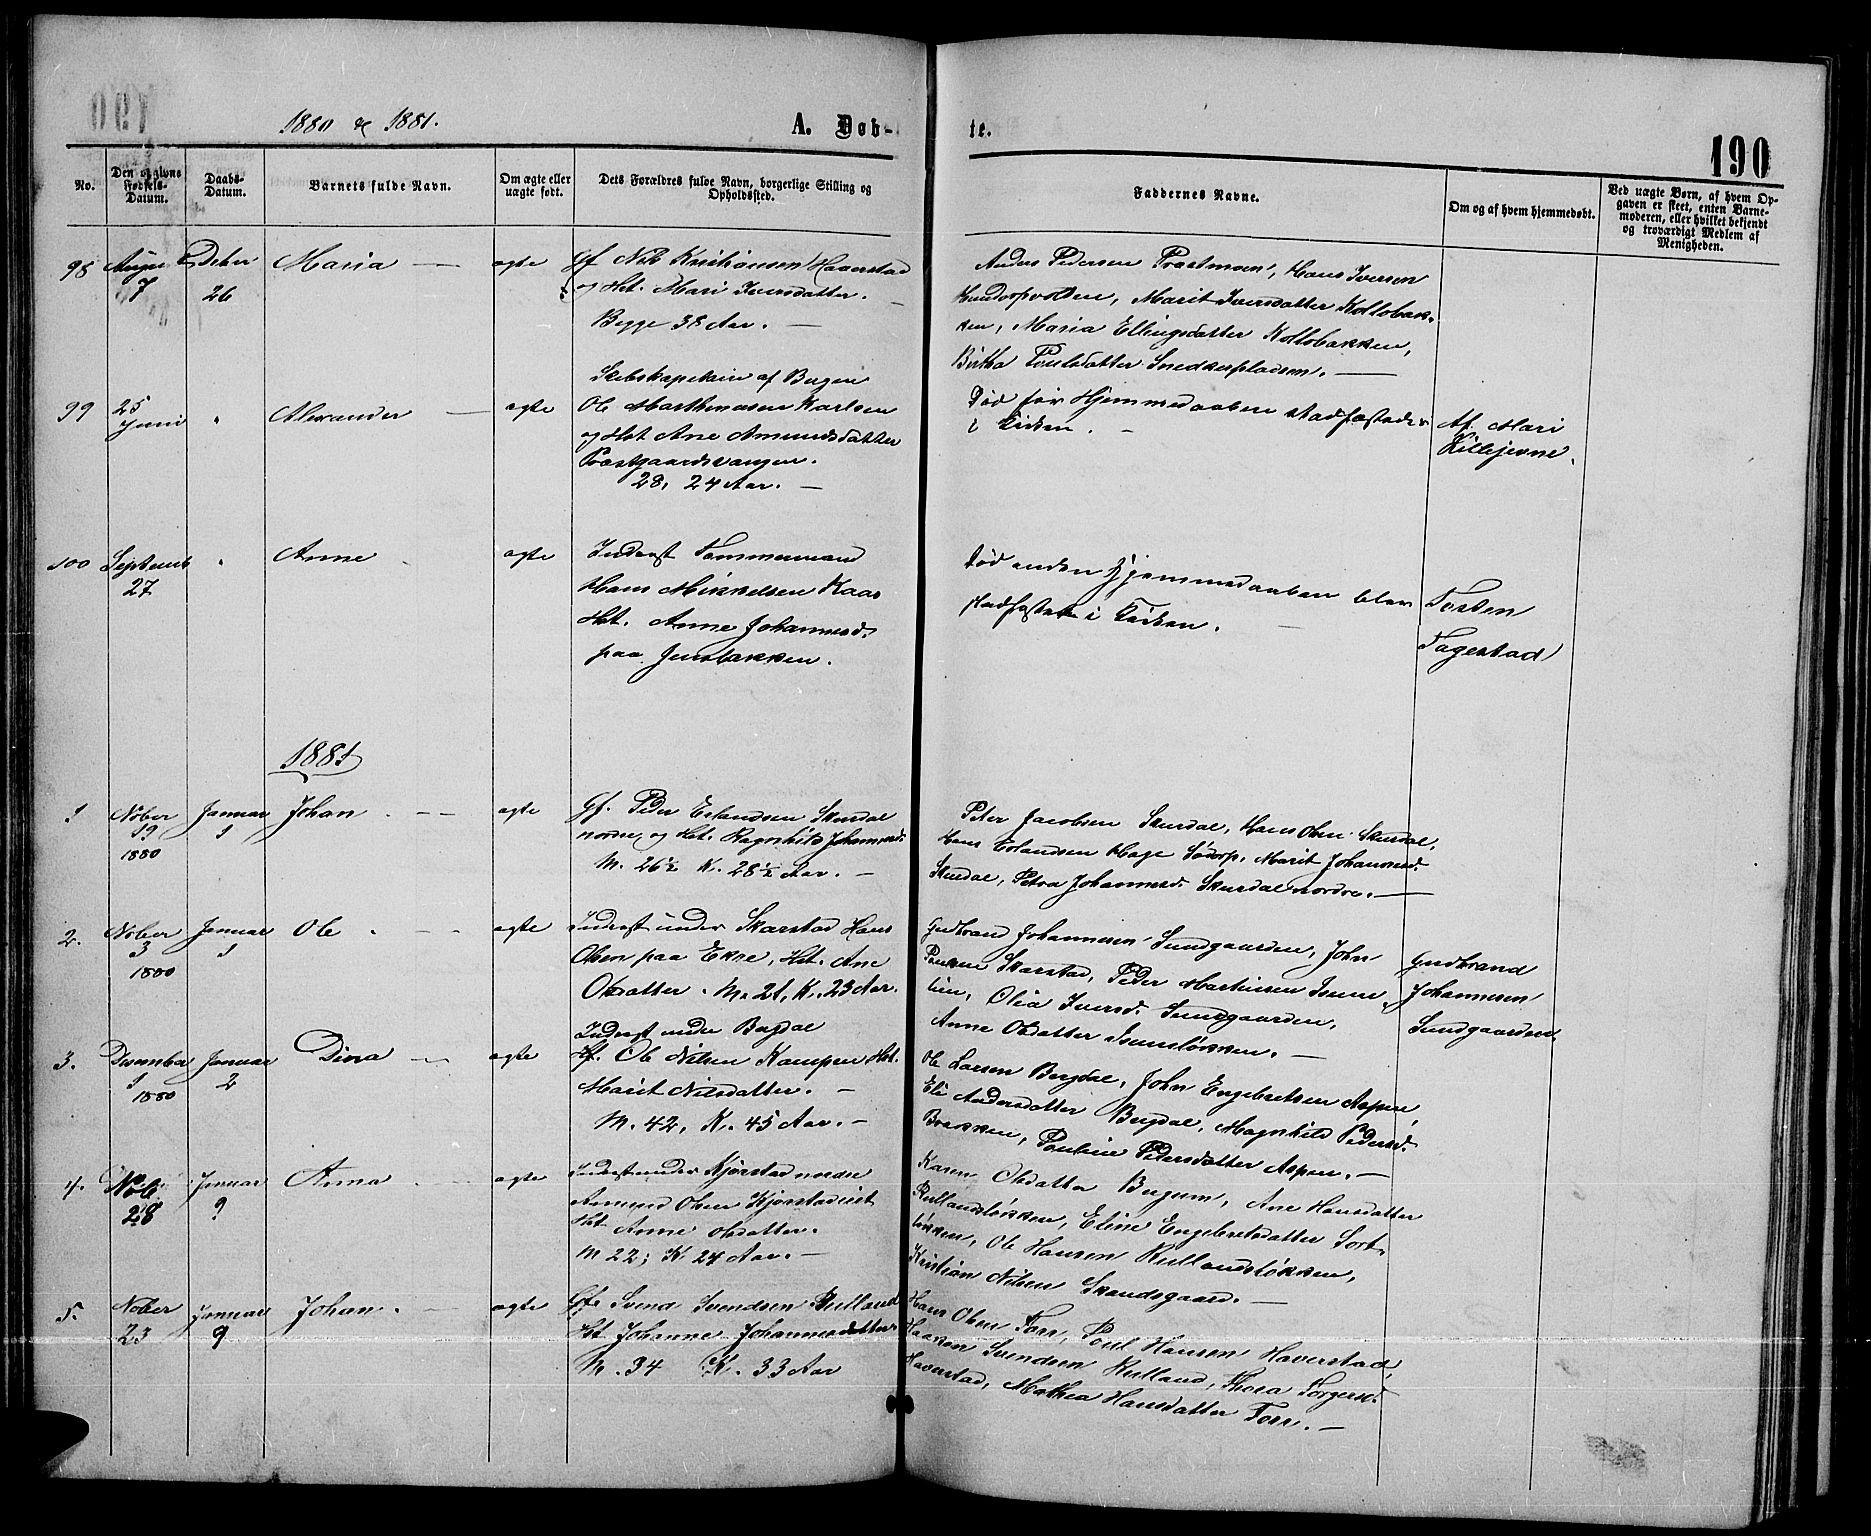 SAH, Sør-Fron prestekontor, H/Ha/Hab/L0002: Klokkerbok nr. 2, 1864-1883, s. 190